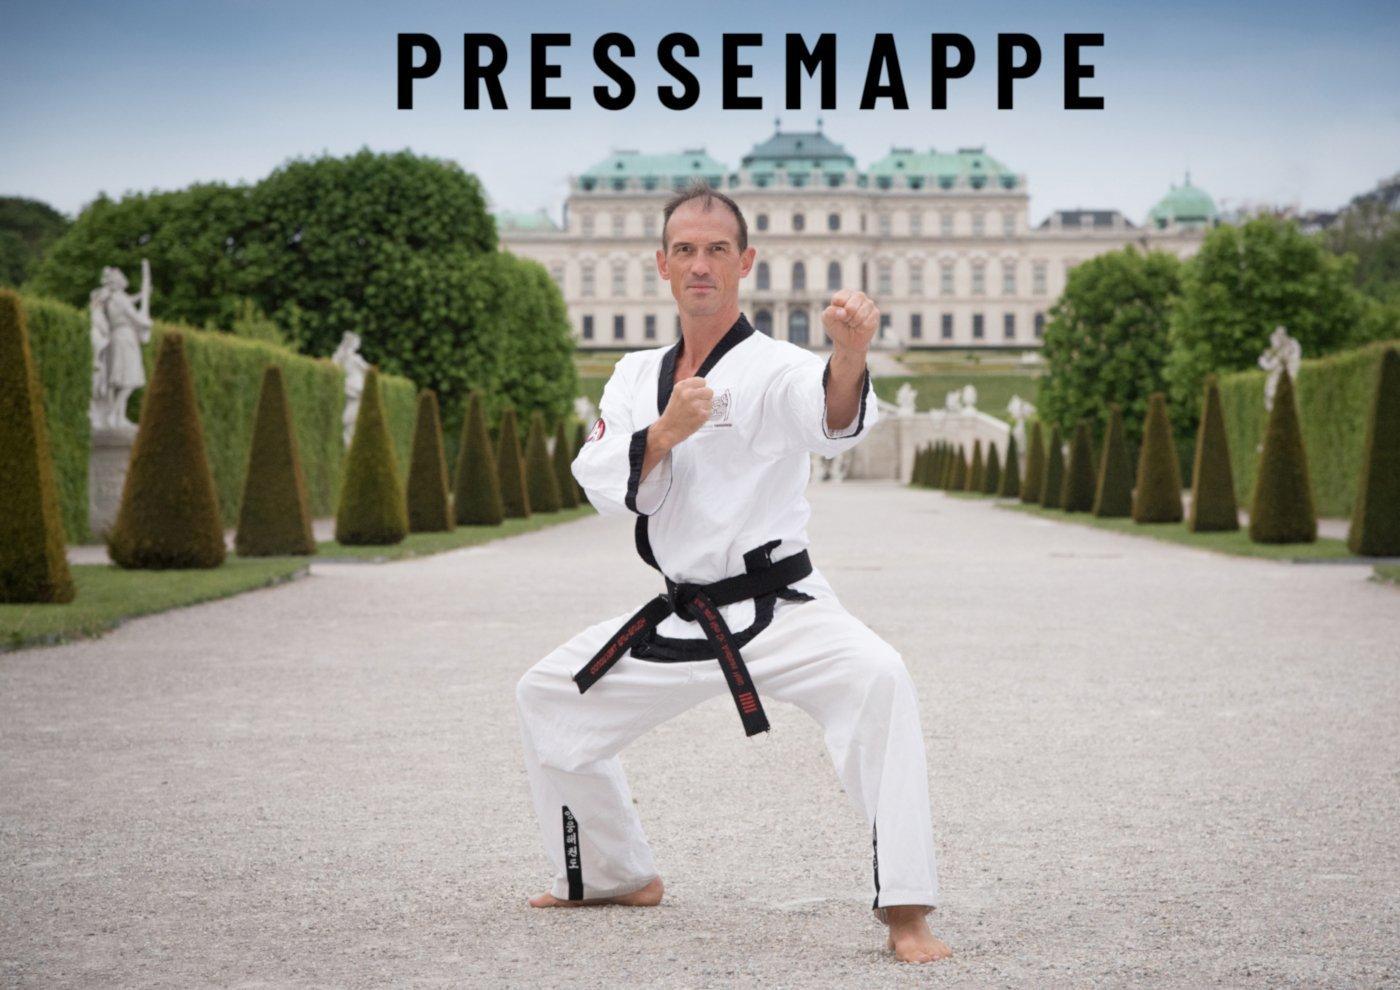 Pressemappe 2020 (Stand: 2020)